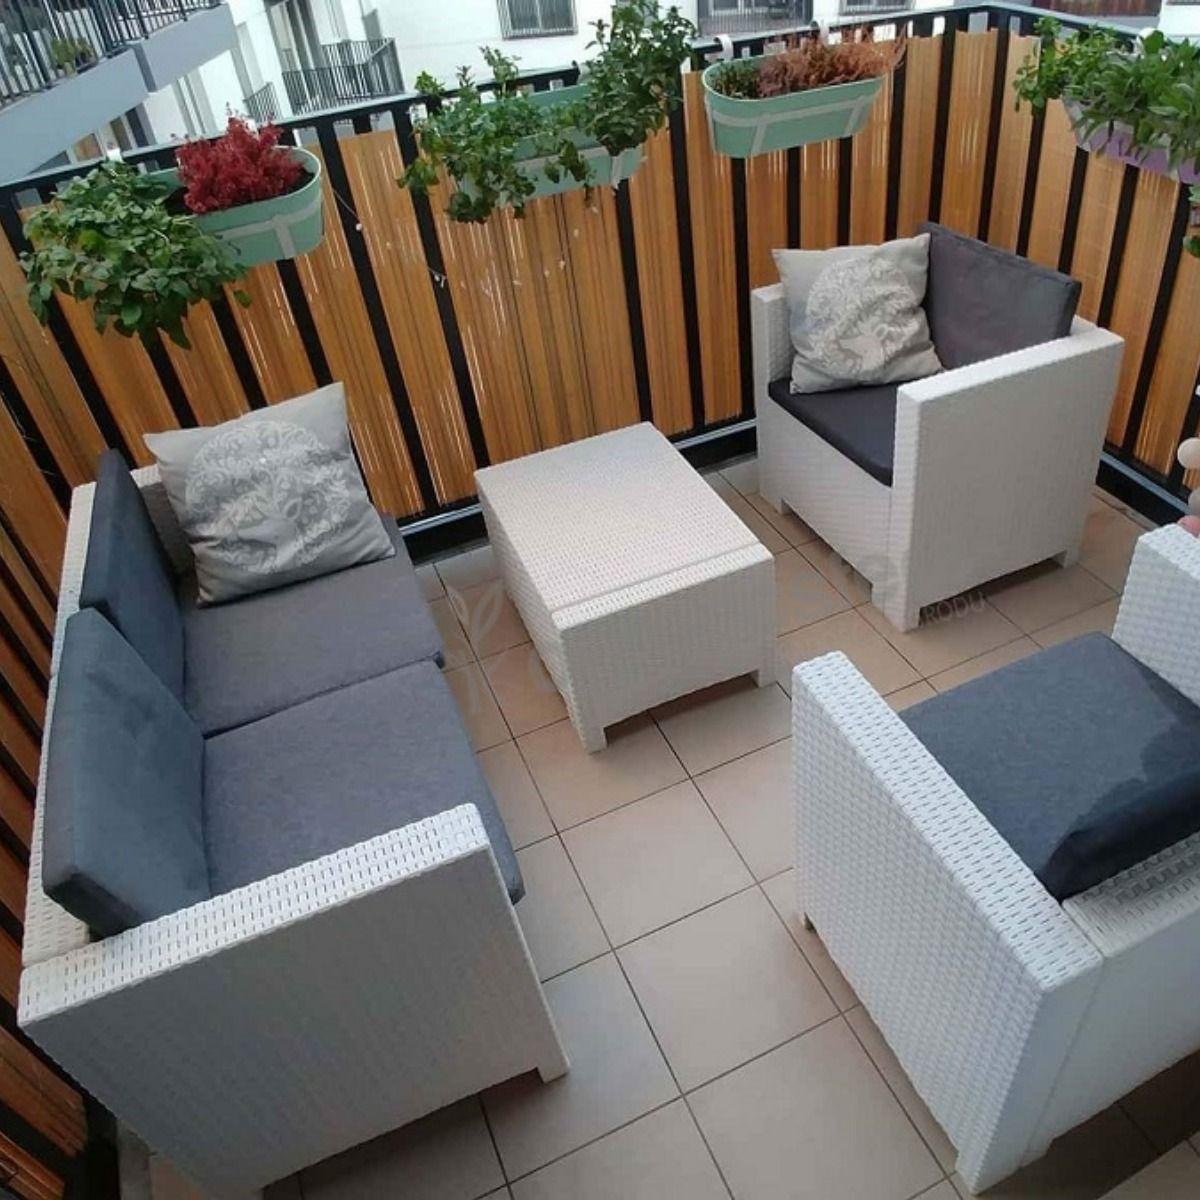 Biale Meble Technorattanowe Z Sofa Colorado Coffee 4 Bica Ogrodosfera Pl Outdoor Furniture Sets Outdoor Furniture Outdoor Sectional Sofa